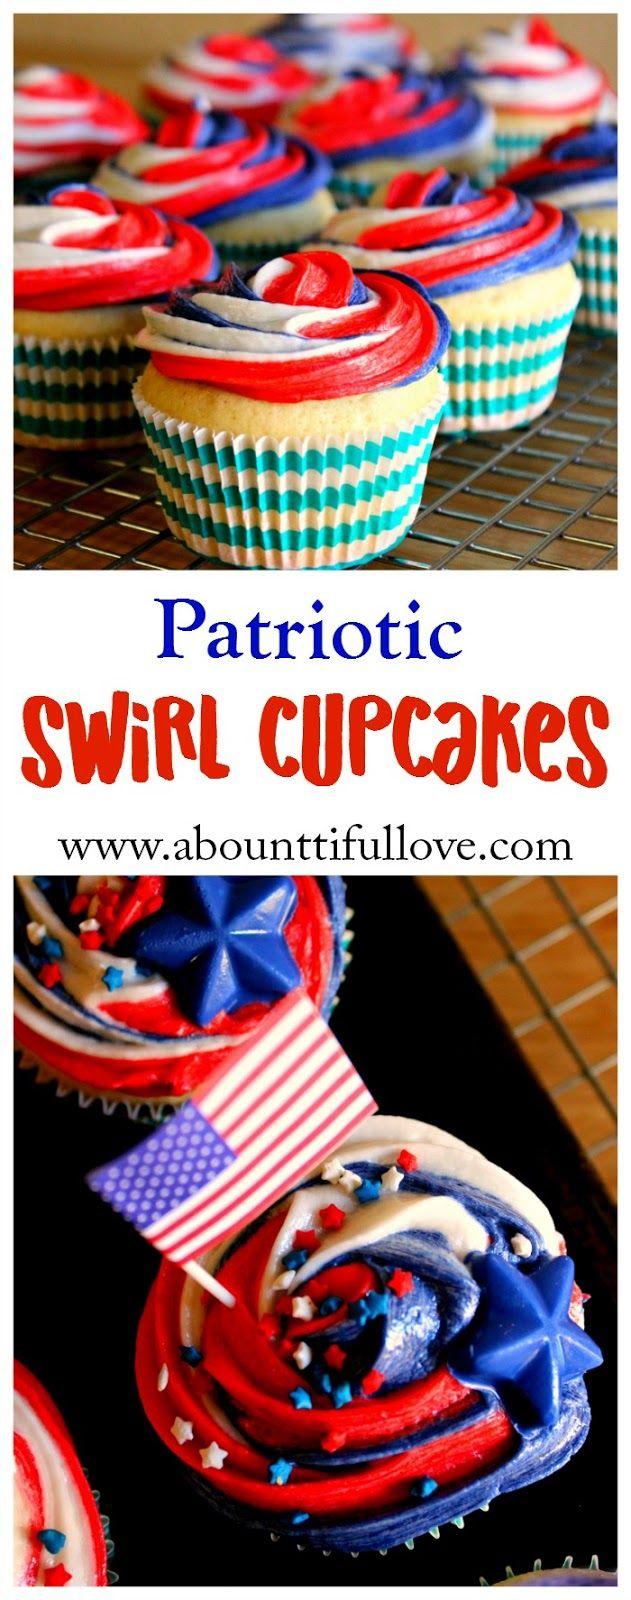 Simple and easy cupcake recipe. Basic white cupcake recipe.